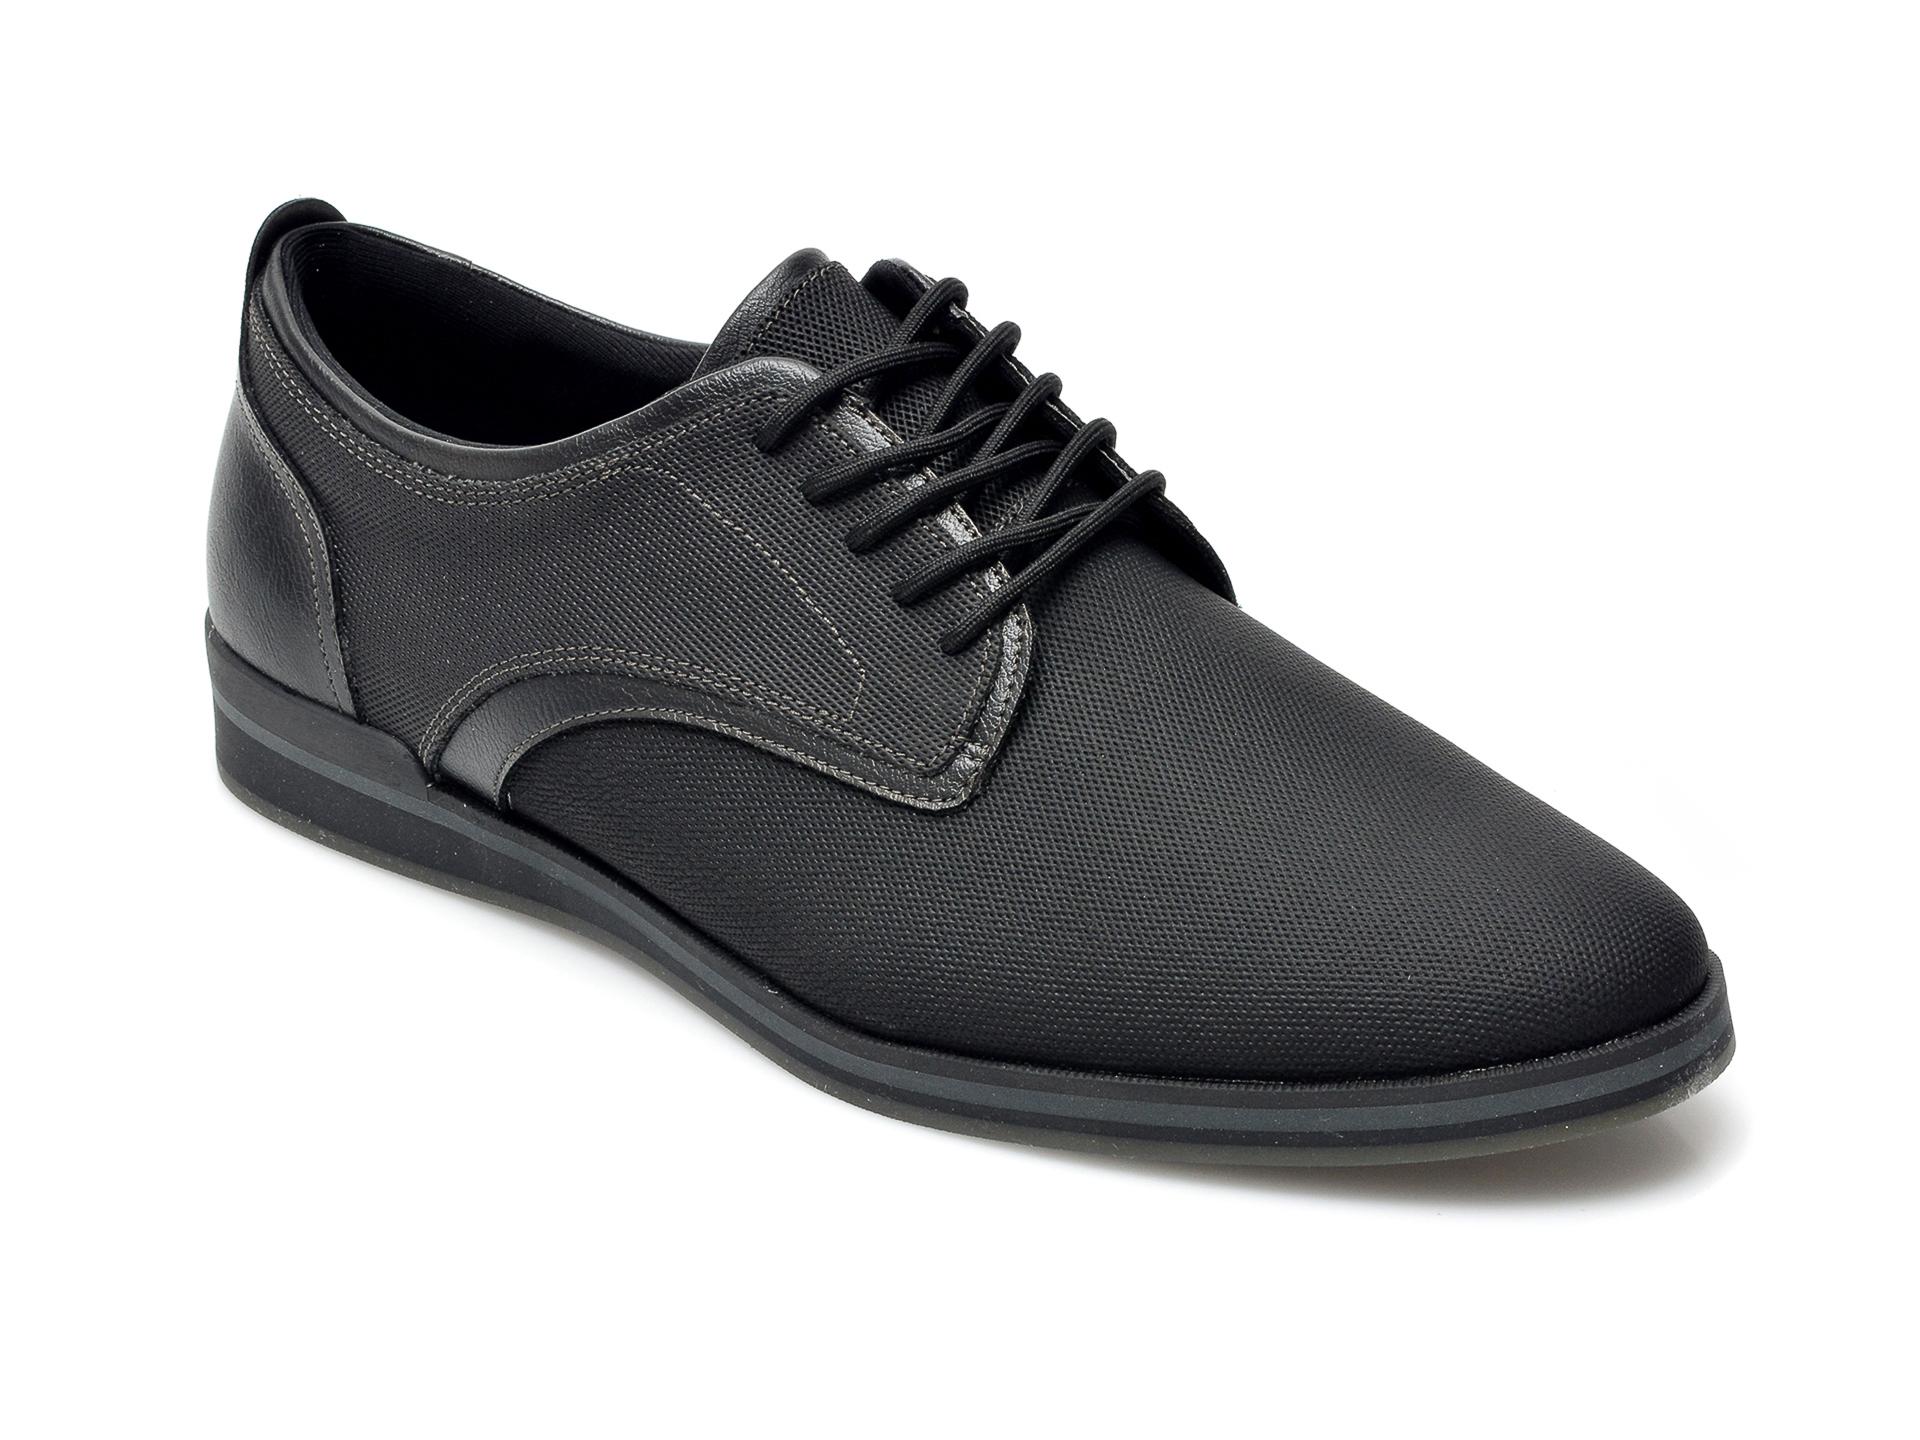 Pantofi ALDO negri, Eowoalian001, din piele ecologica imagine otter.ro 2021